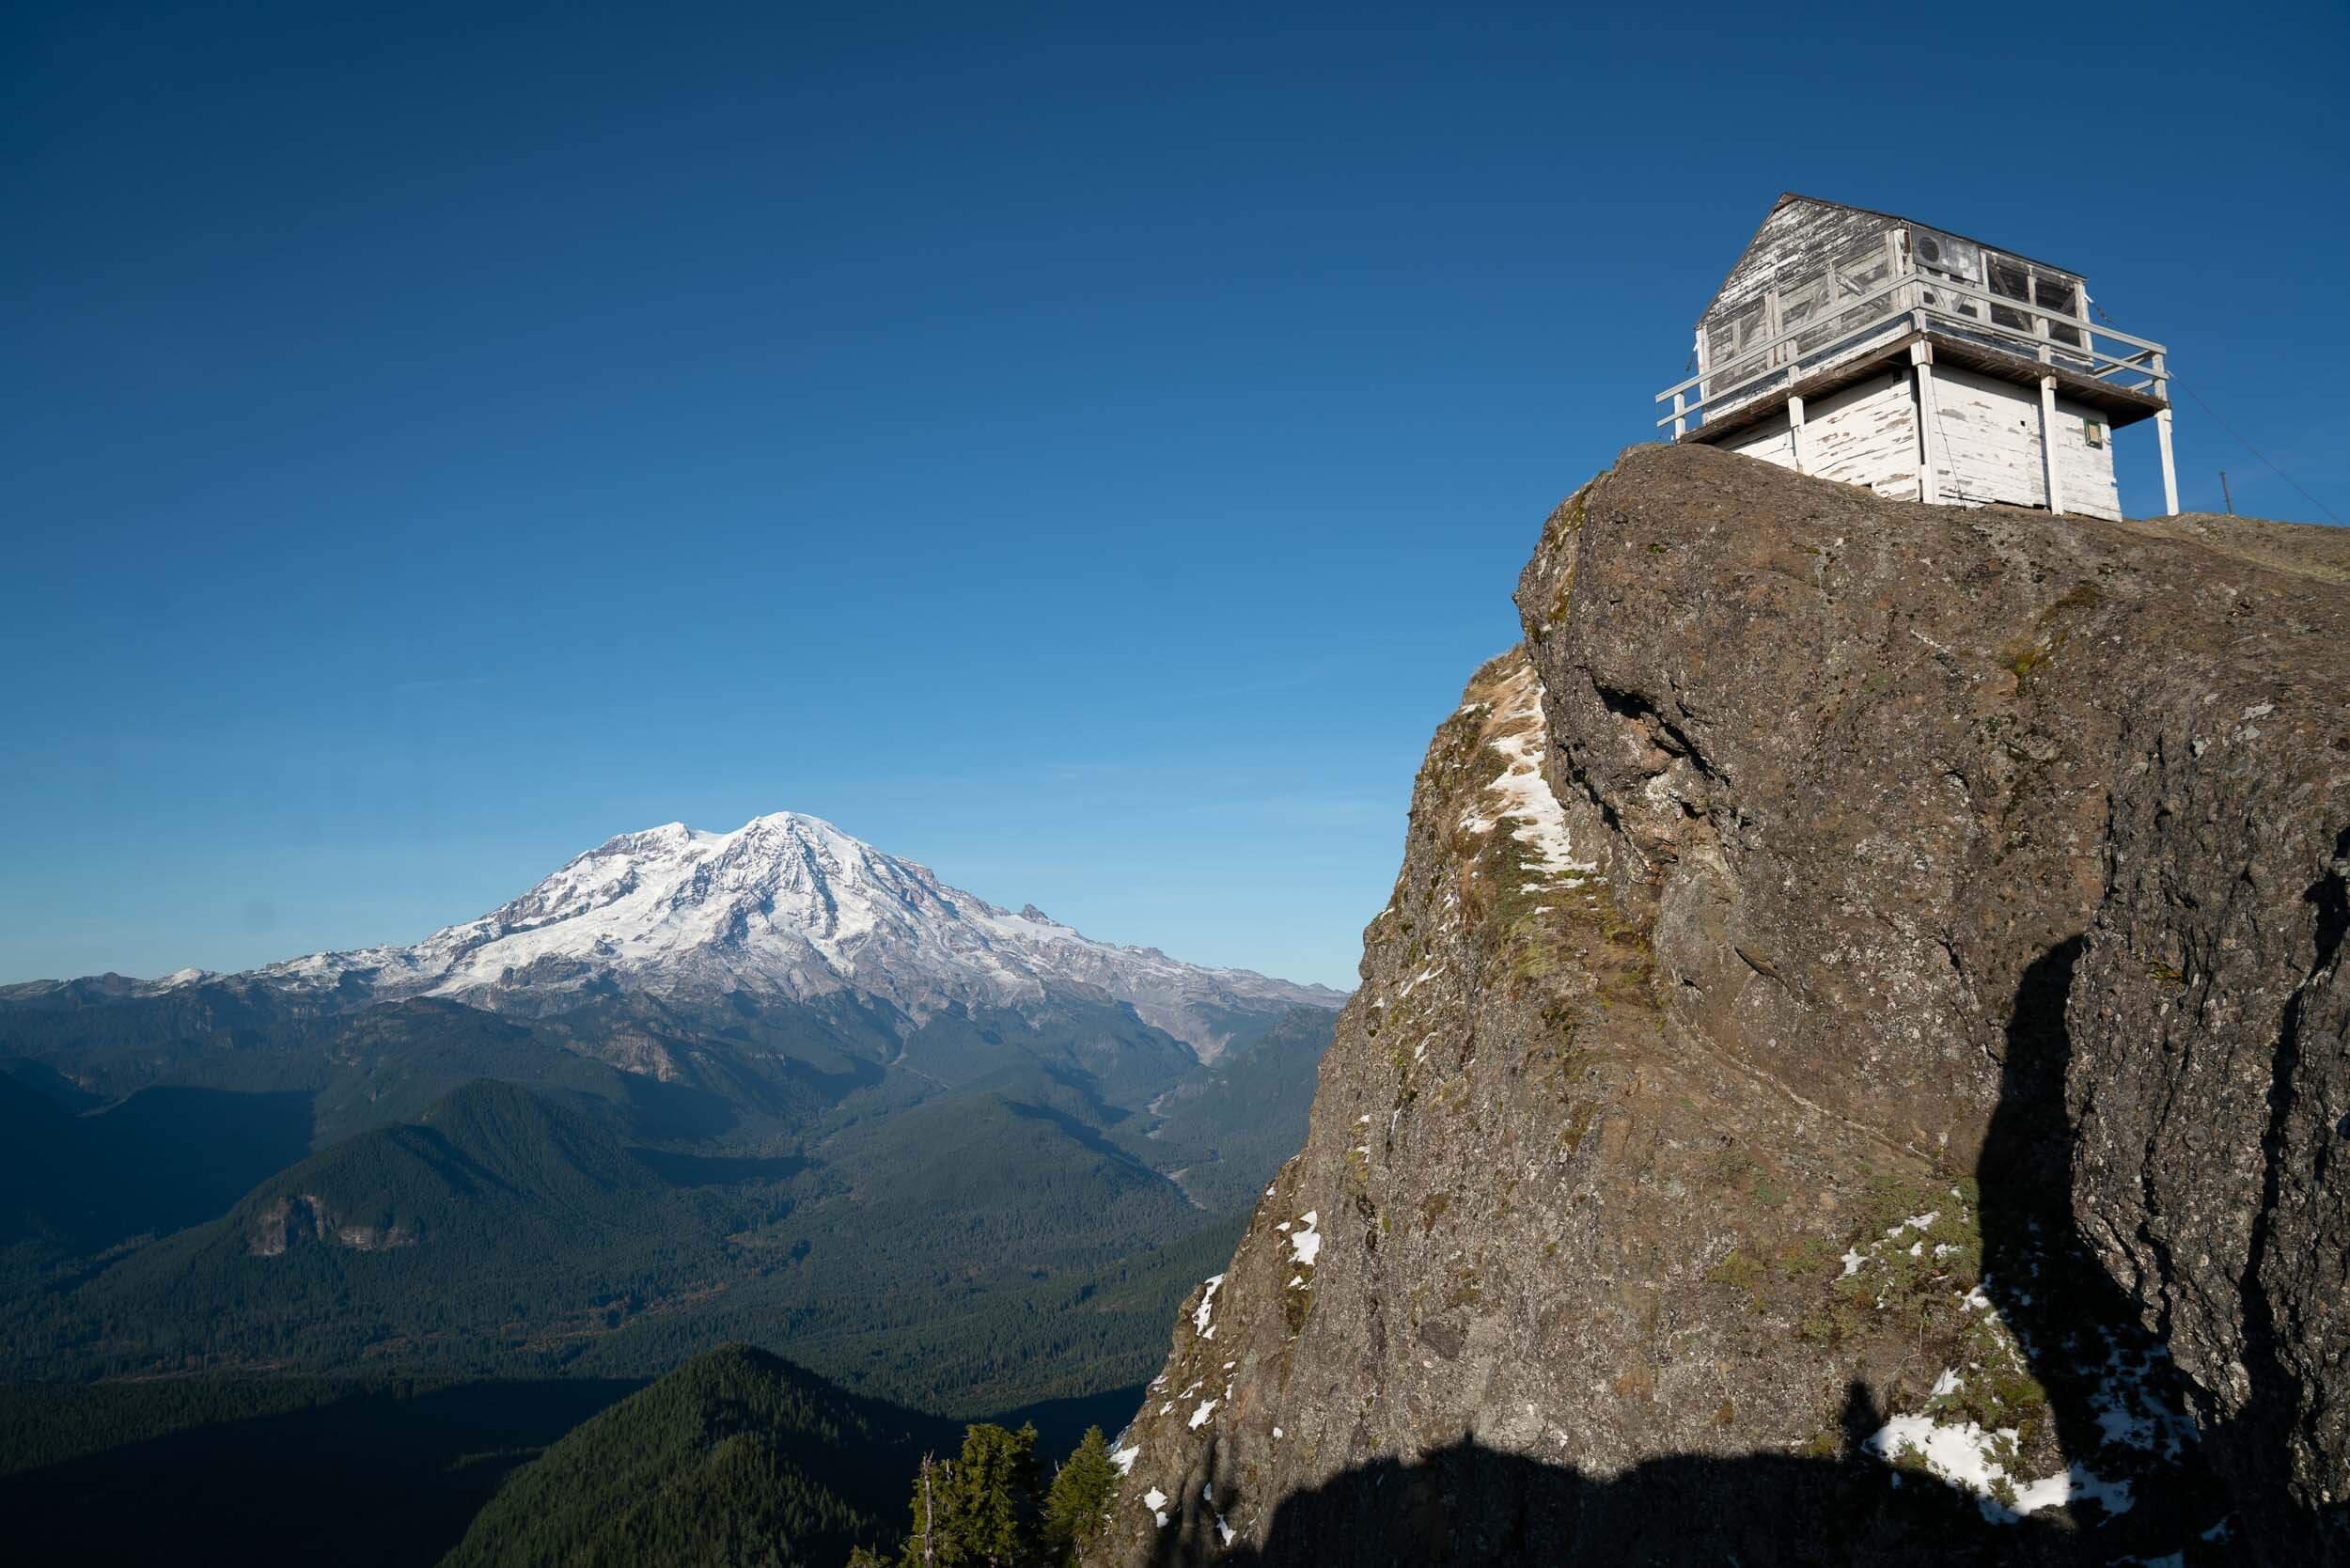 High Rock Lookout has beautiful views of Mount Rainier.